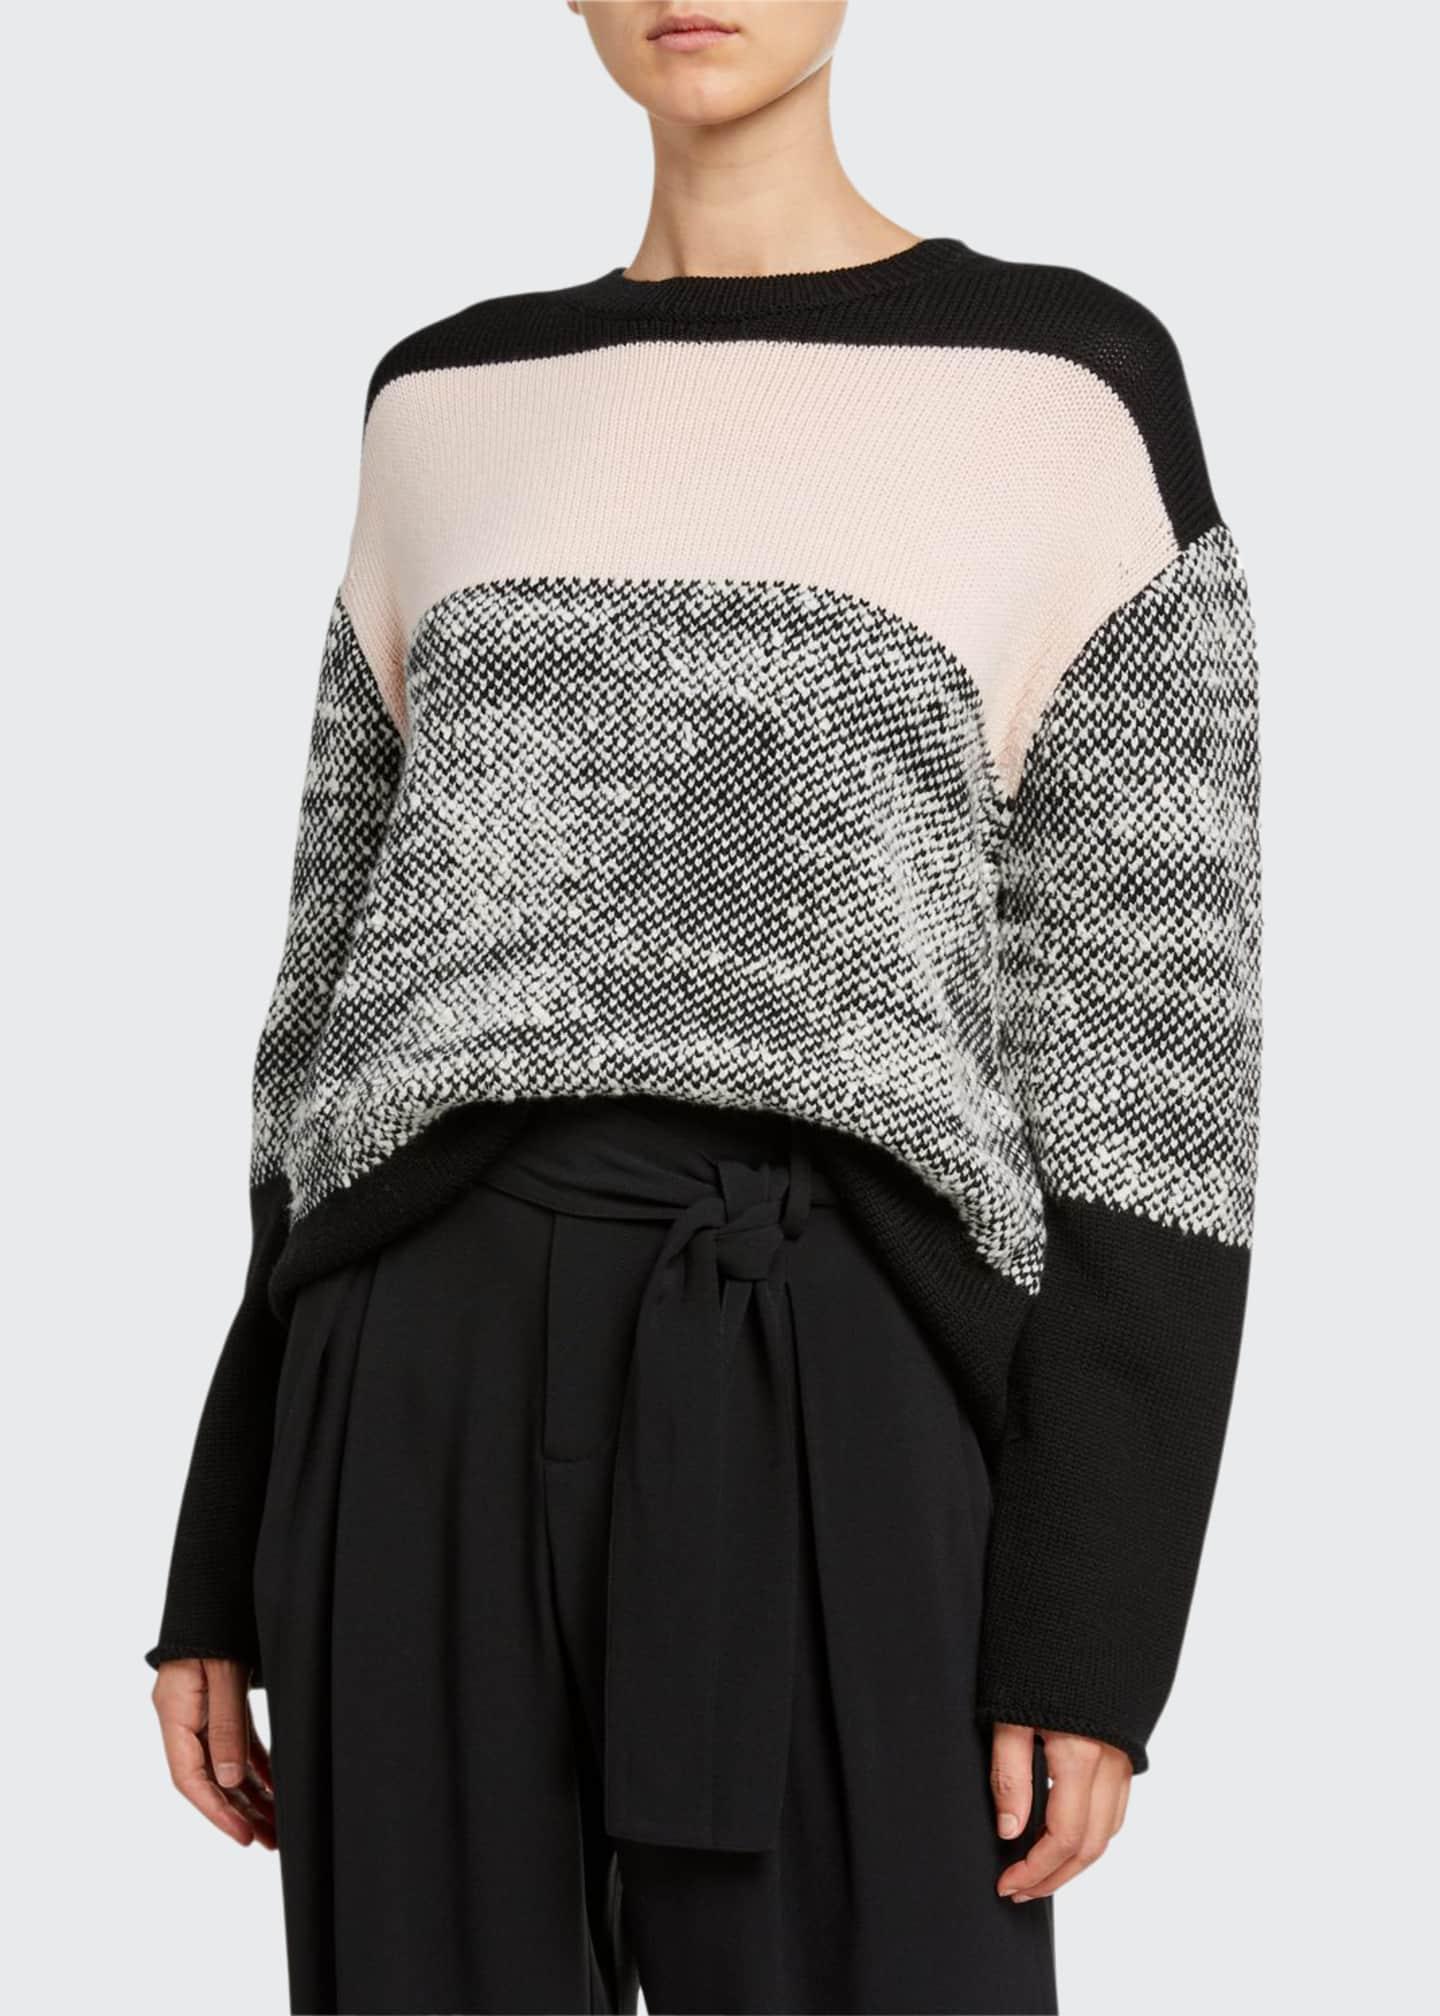 Jason Wu Colorblock Merino Wool Crewneck Long-Sleeve Sweater